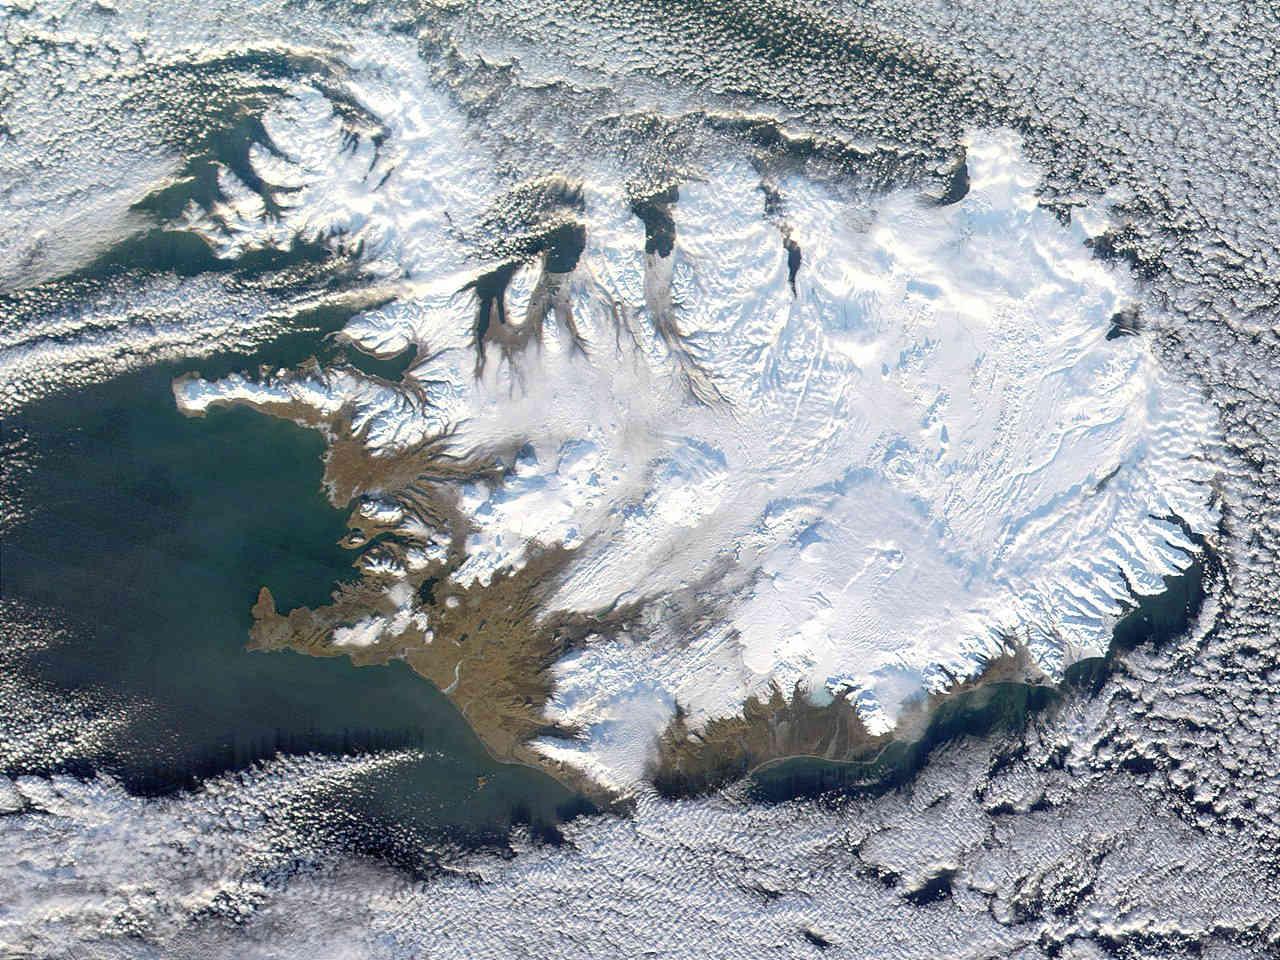 Klimaatverandering beïnvloedt vulkanisme